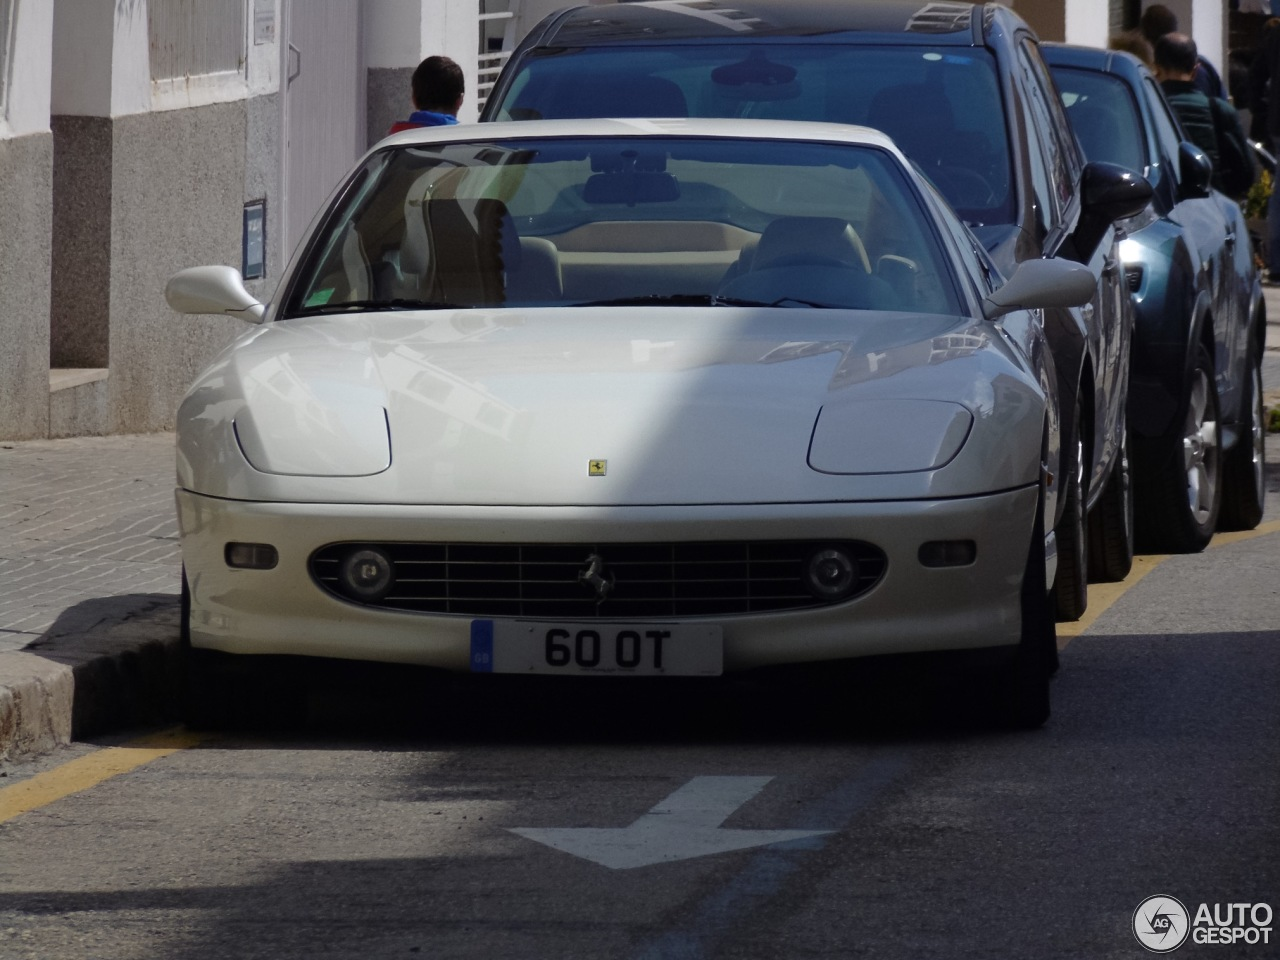 2010 Ferrari 456M GT photo - 3